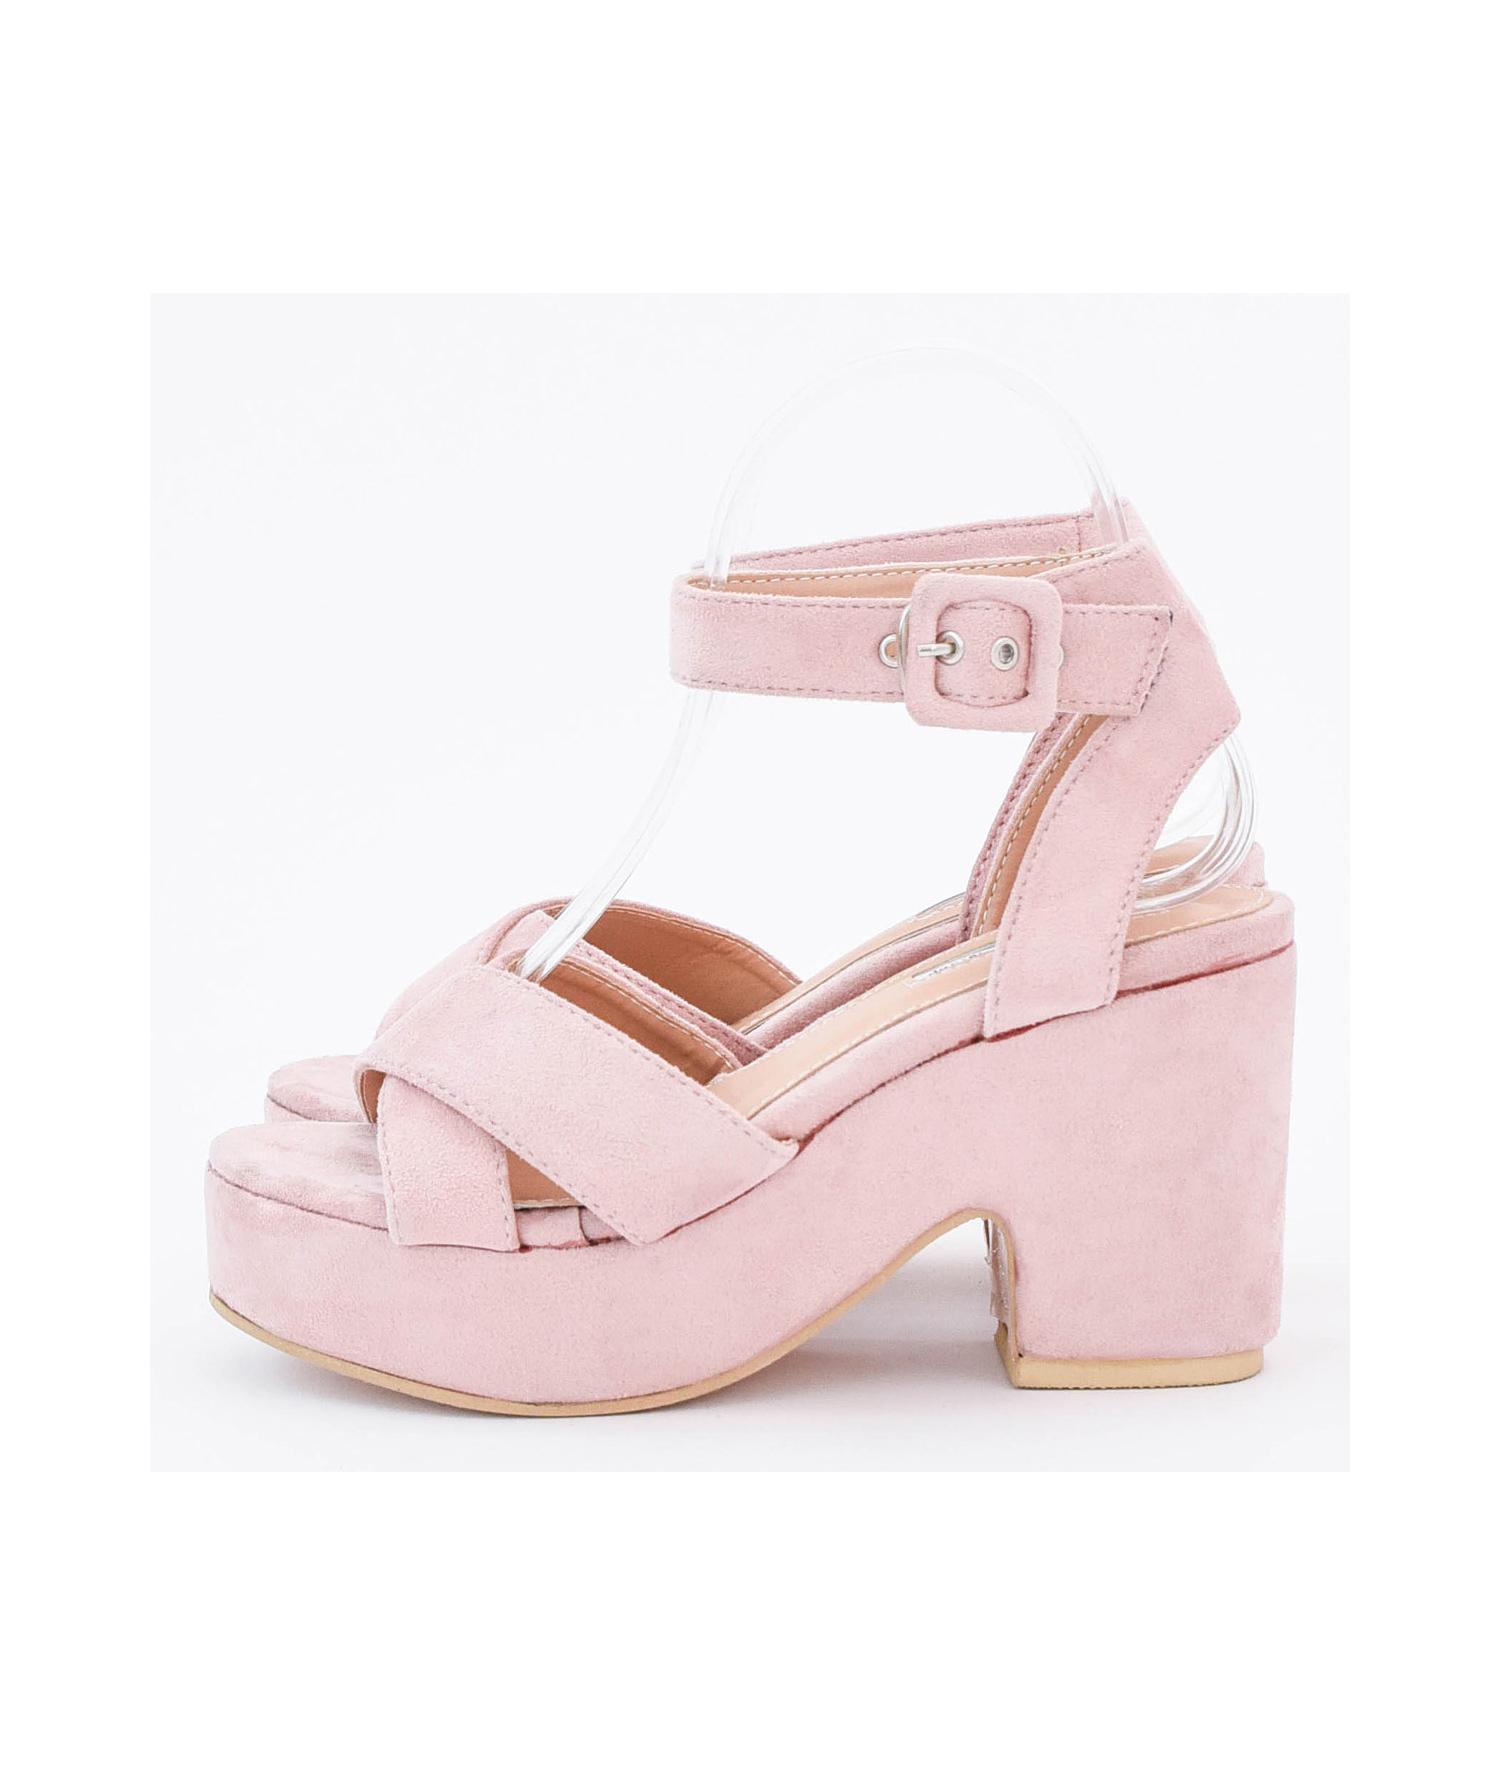 e94dc9d2d079 AnnaKastle Womens Vegan Suede Ankle Strap Platform Sandals Pink